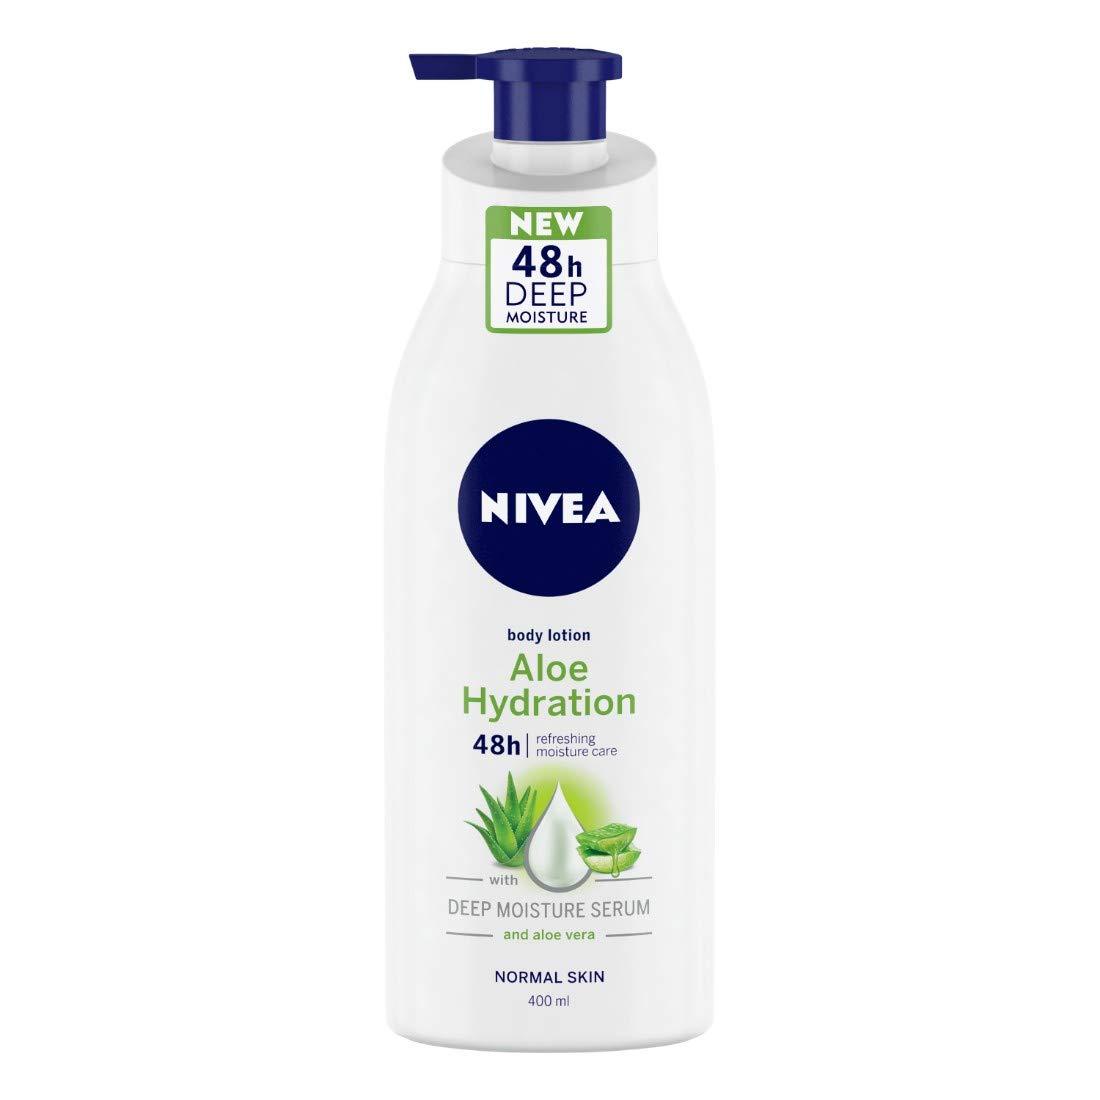 NIVEA Aloe Hydration Body Lotion, 400ml, with deep moisture